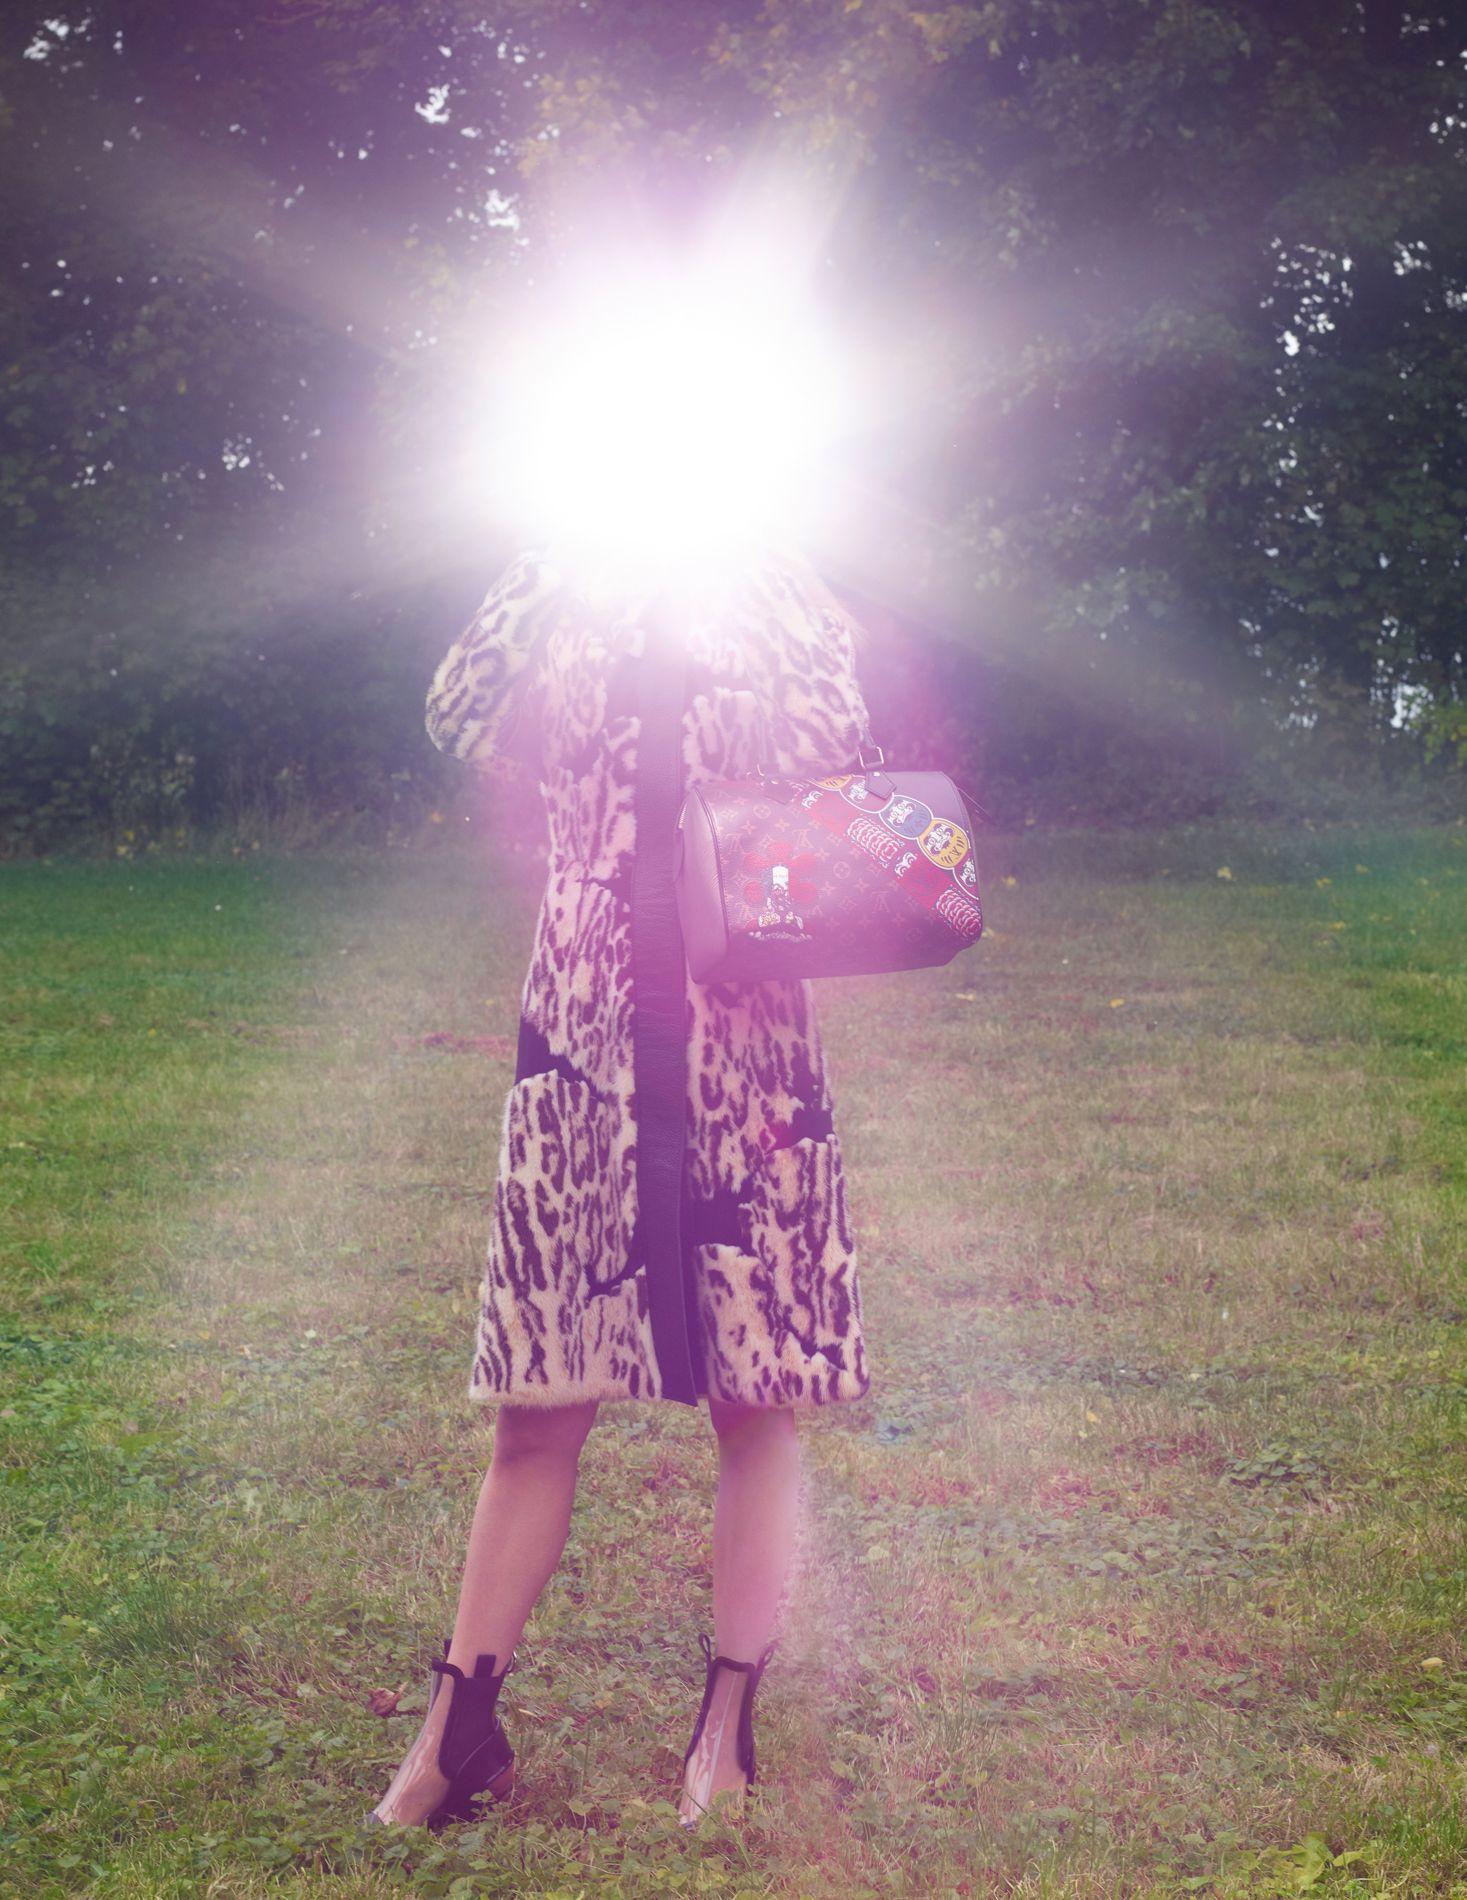 Sac De Jeu Nomade le sac, la pièce maîtresse de notre style - madame figaro